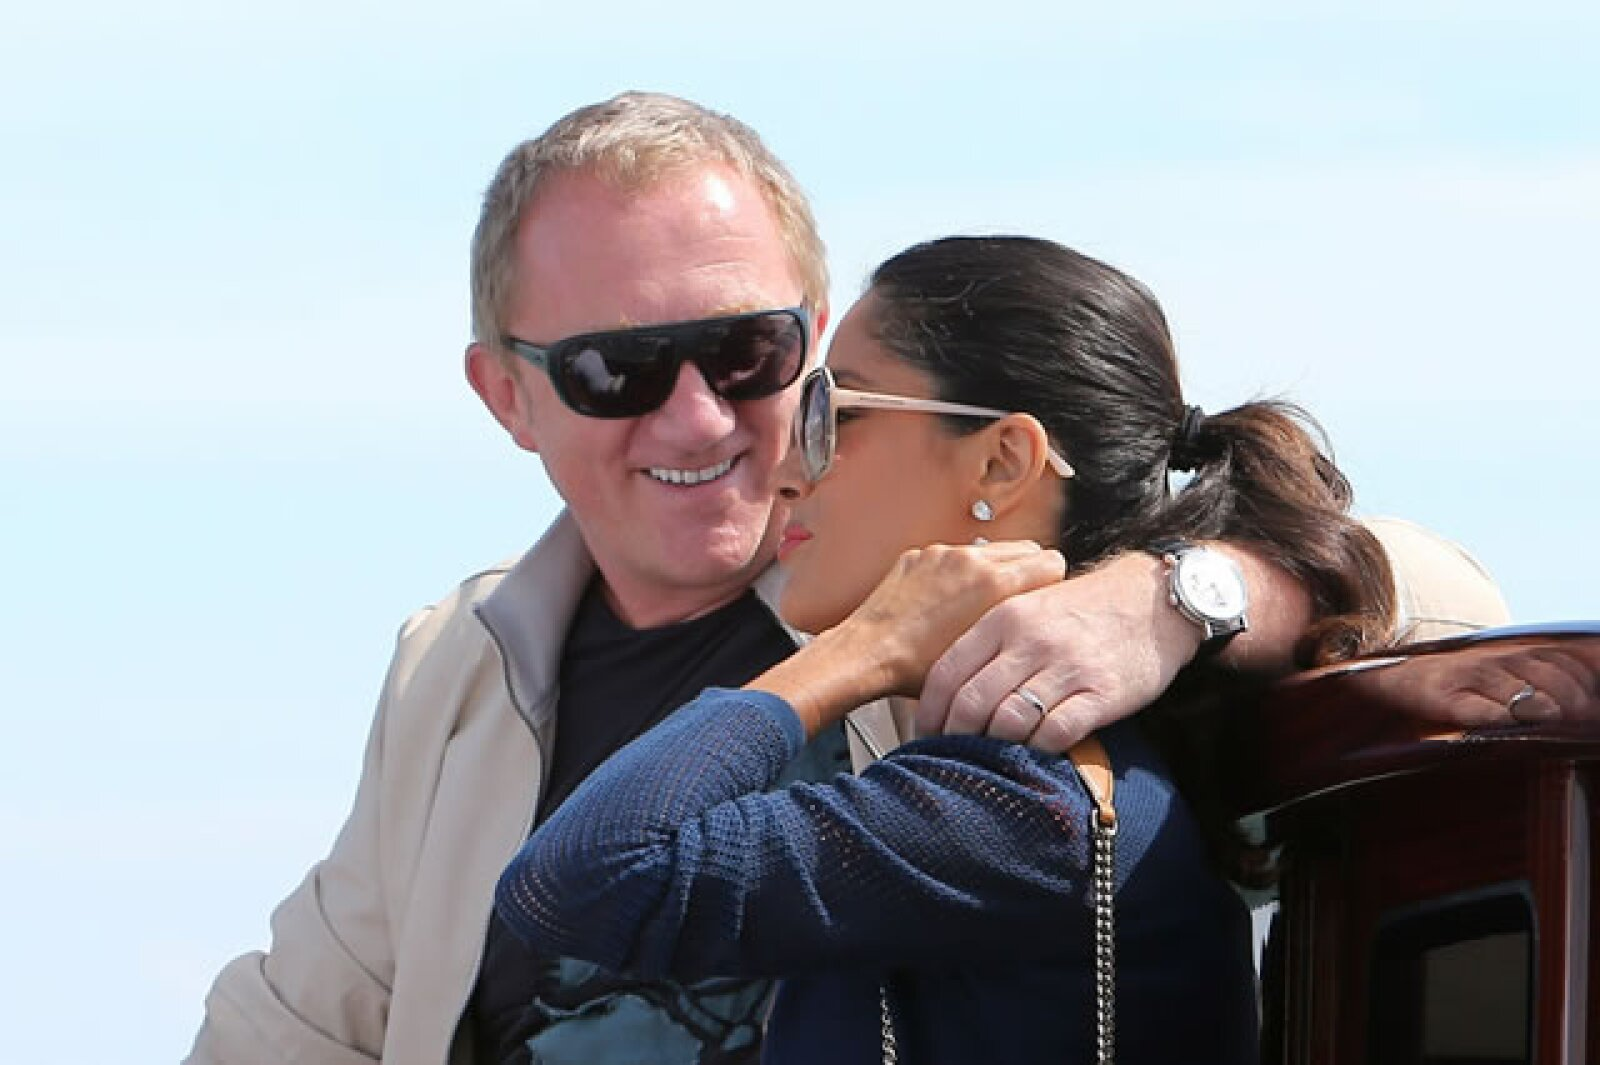 En septiembre de 2007, Salma dio a luz a Valentina Paloma, la primera hija de Hayek, pero la tercera de Pinault.